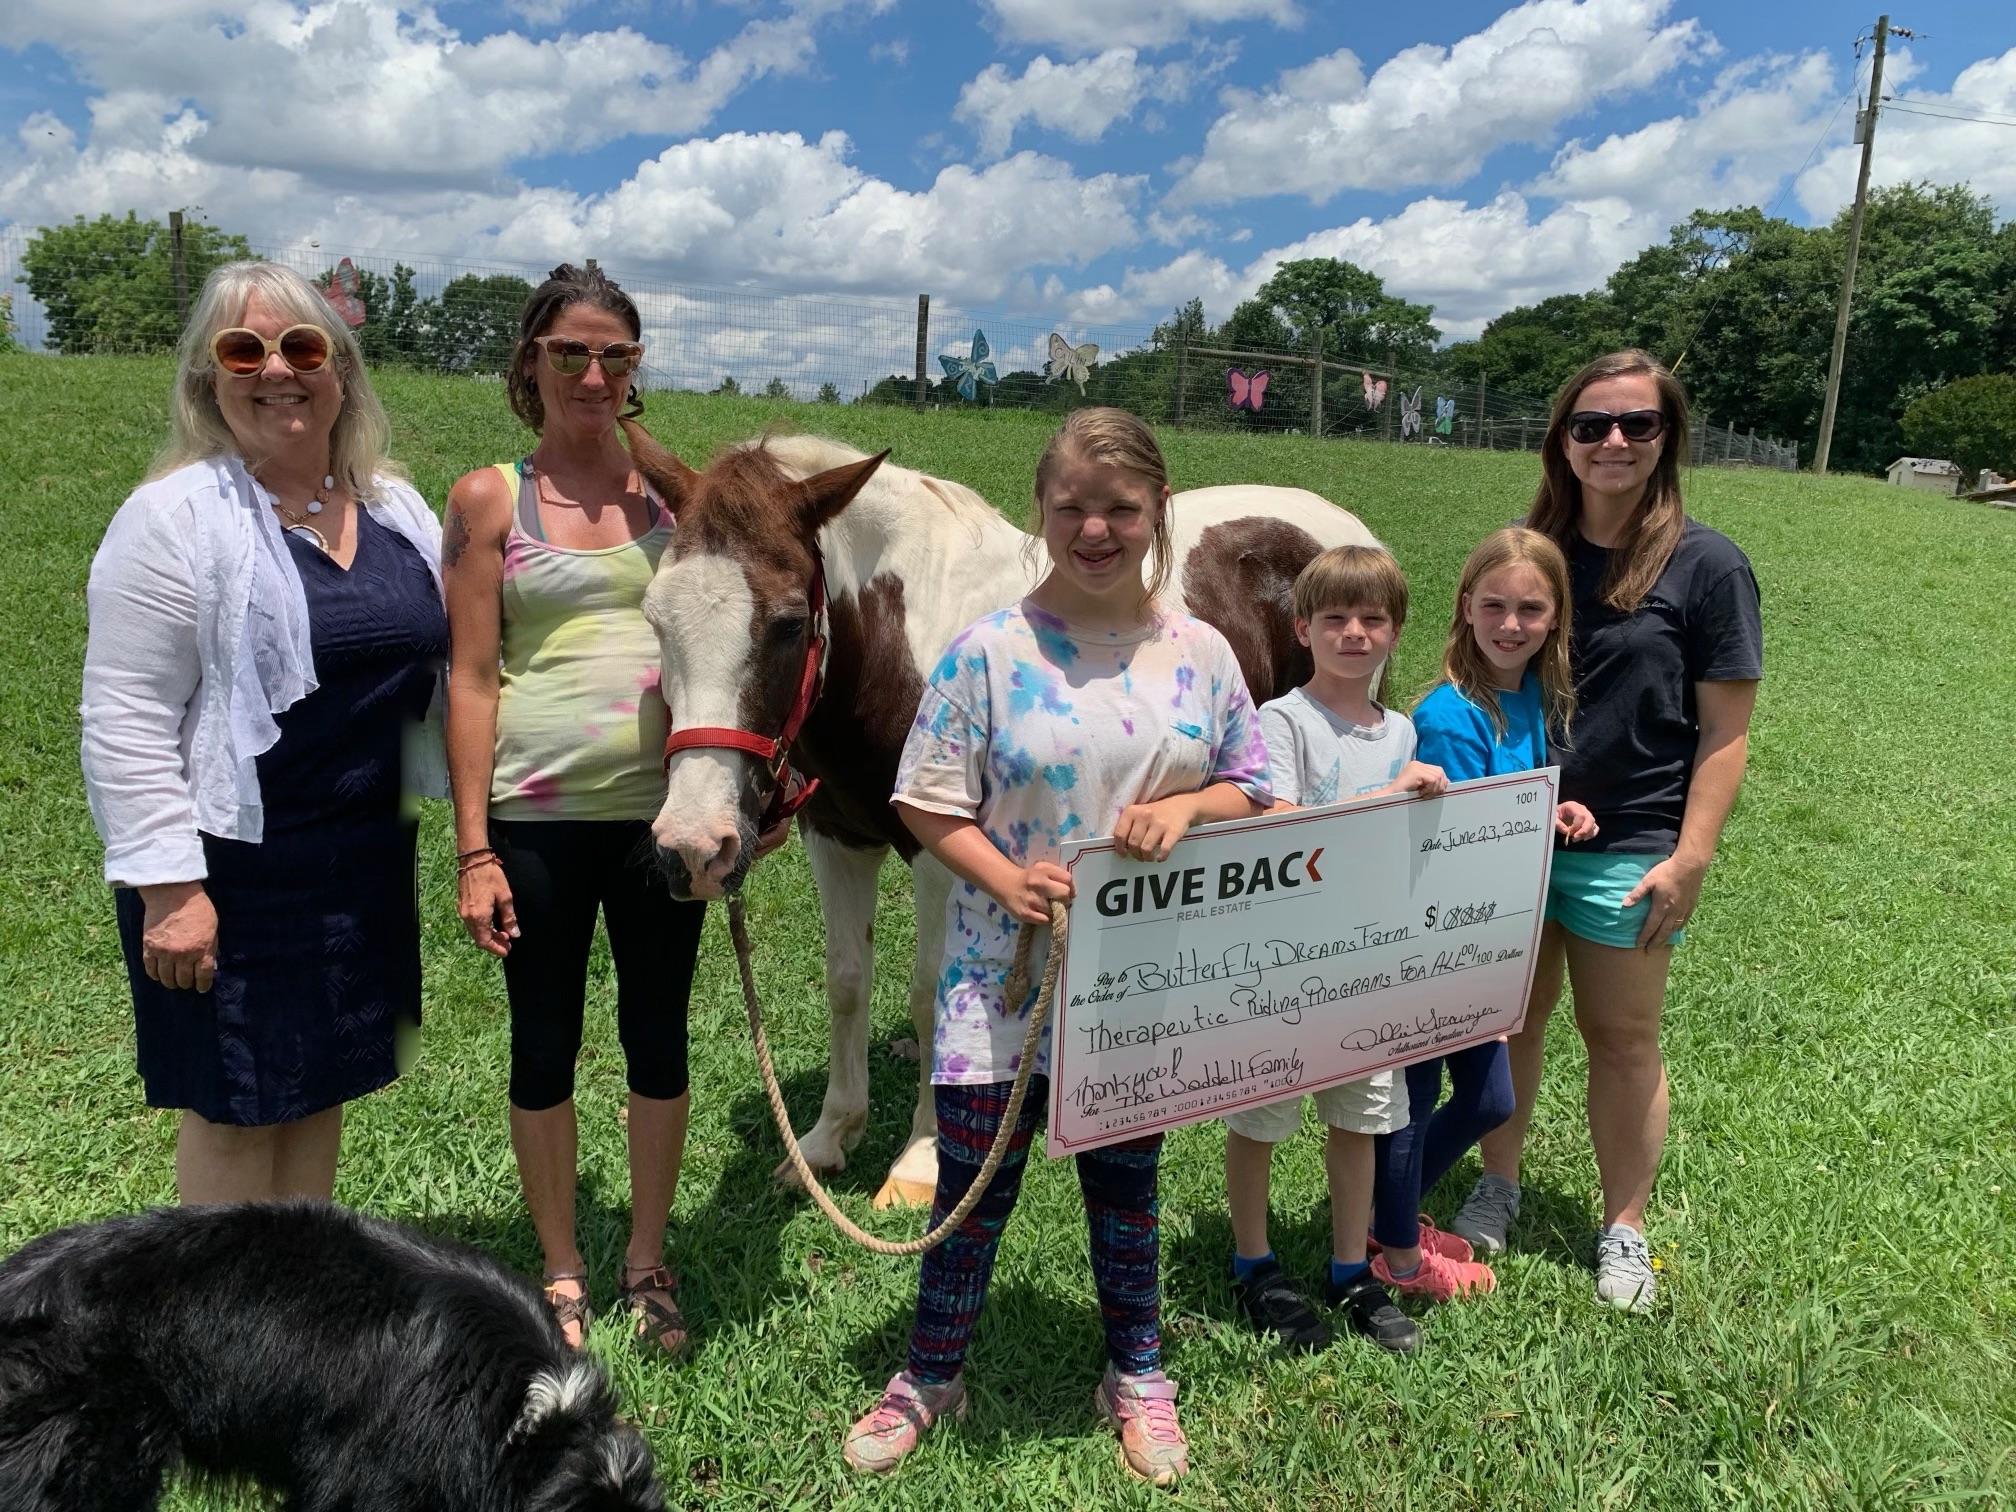 Debbie Grainger GIVES BACK to Butterfly Dreams Farm